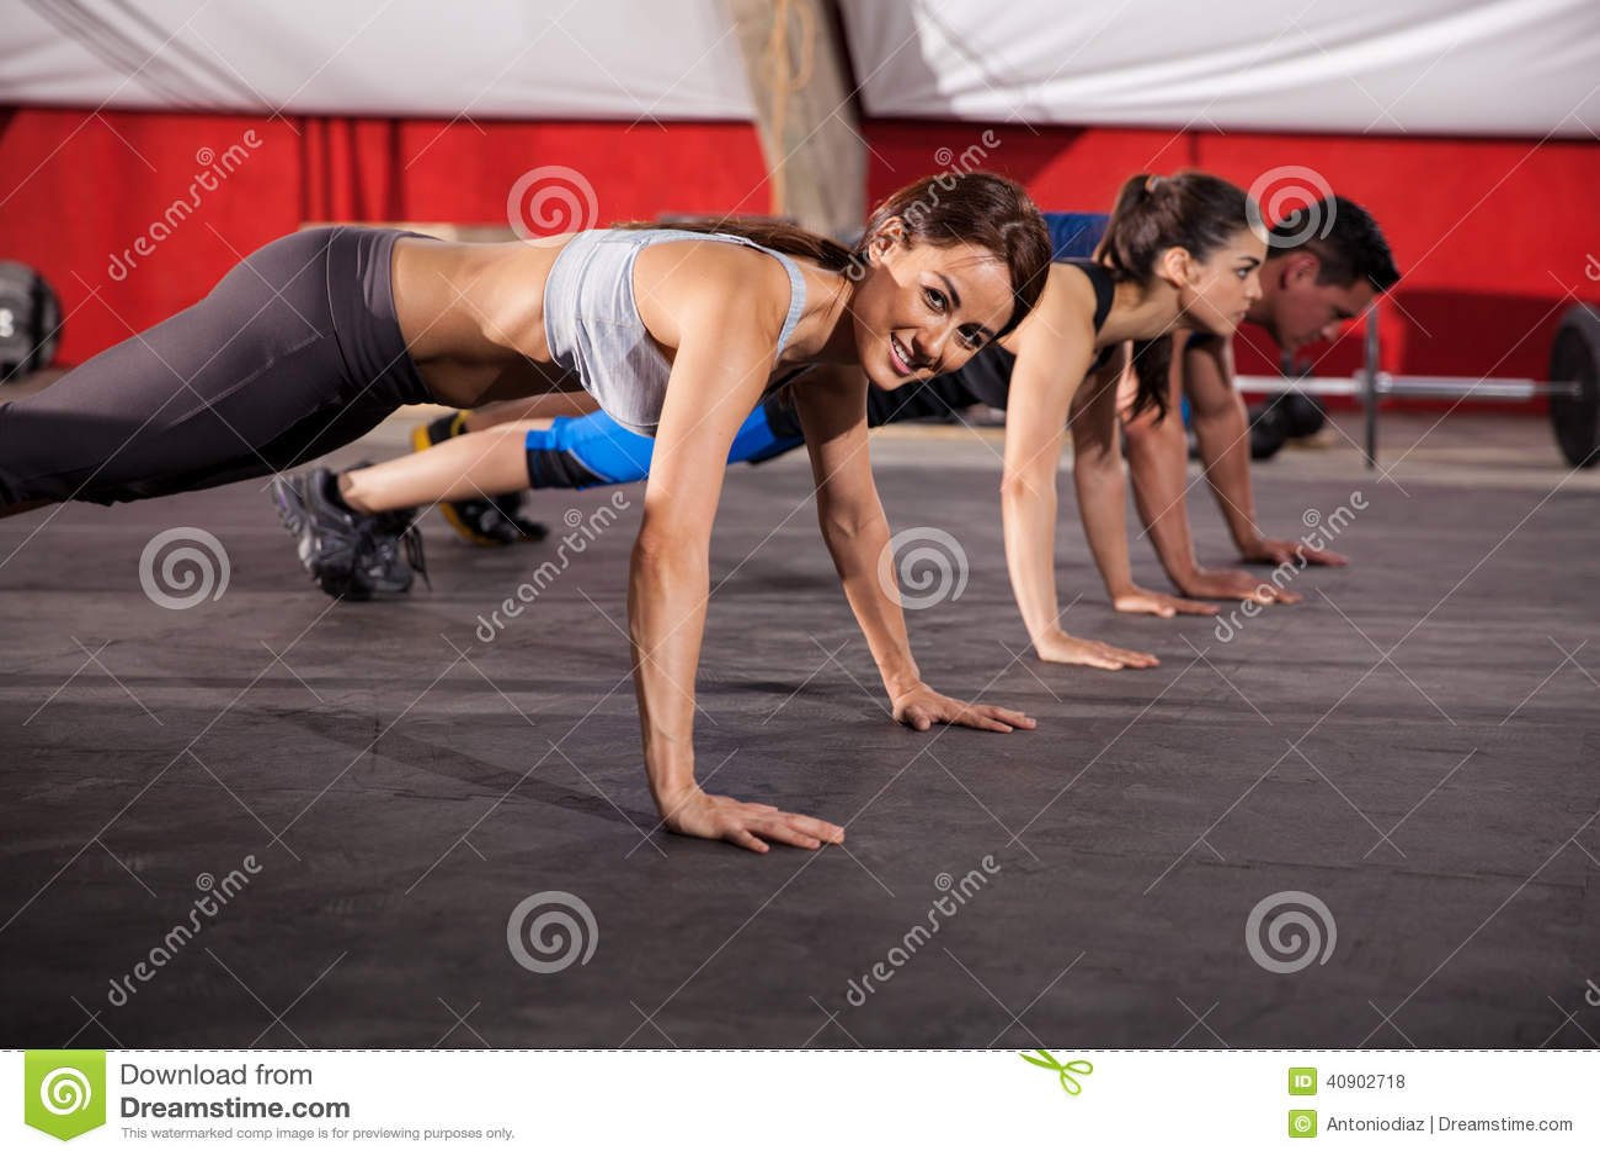 Doing push ups at a gym